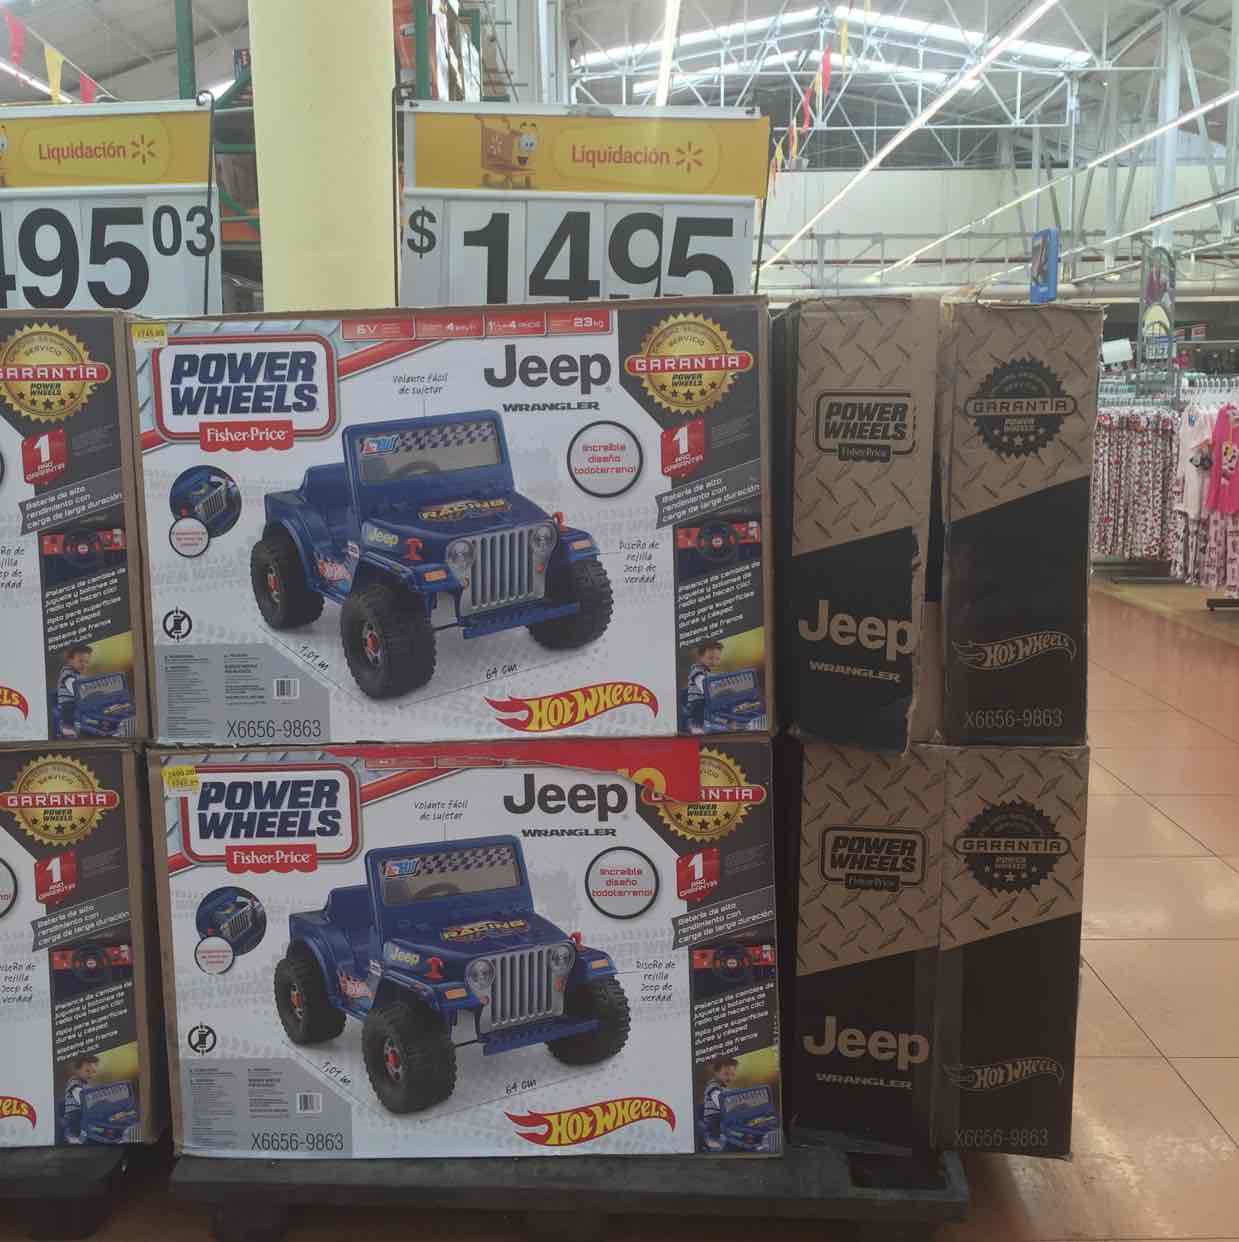 Walmart: Carro eléctrico Power Wheels Jeep de Hot Wheels a $1,495, casita Step 2 Neat & Tidy a $1,595